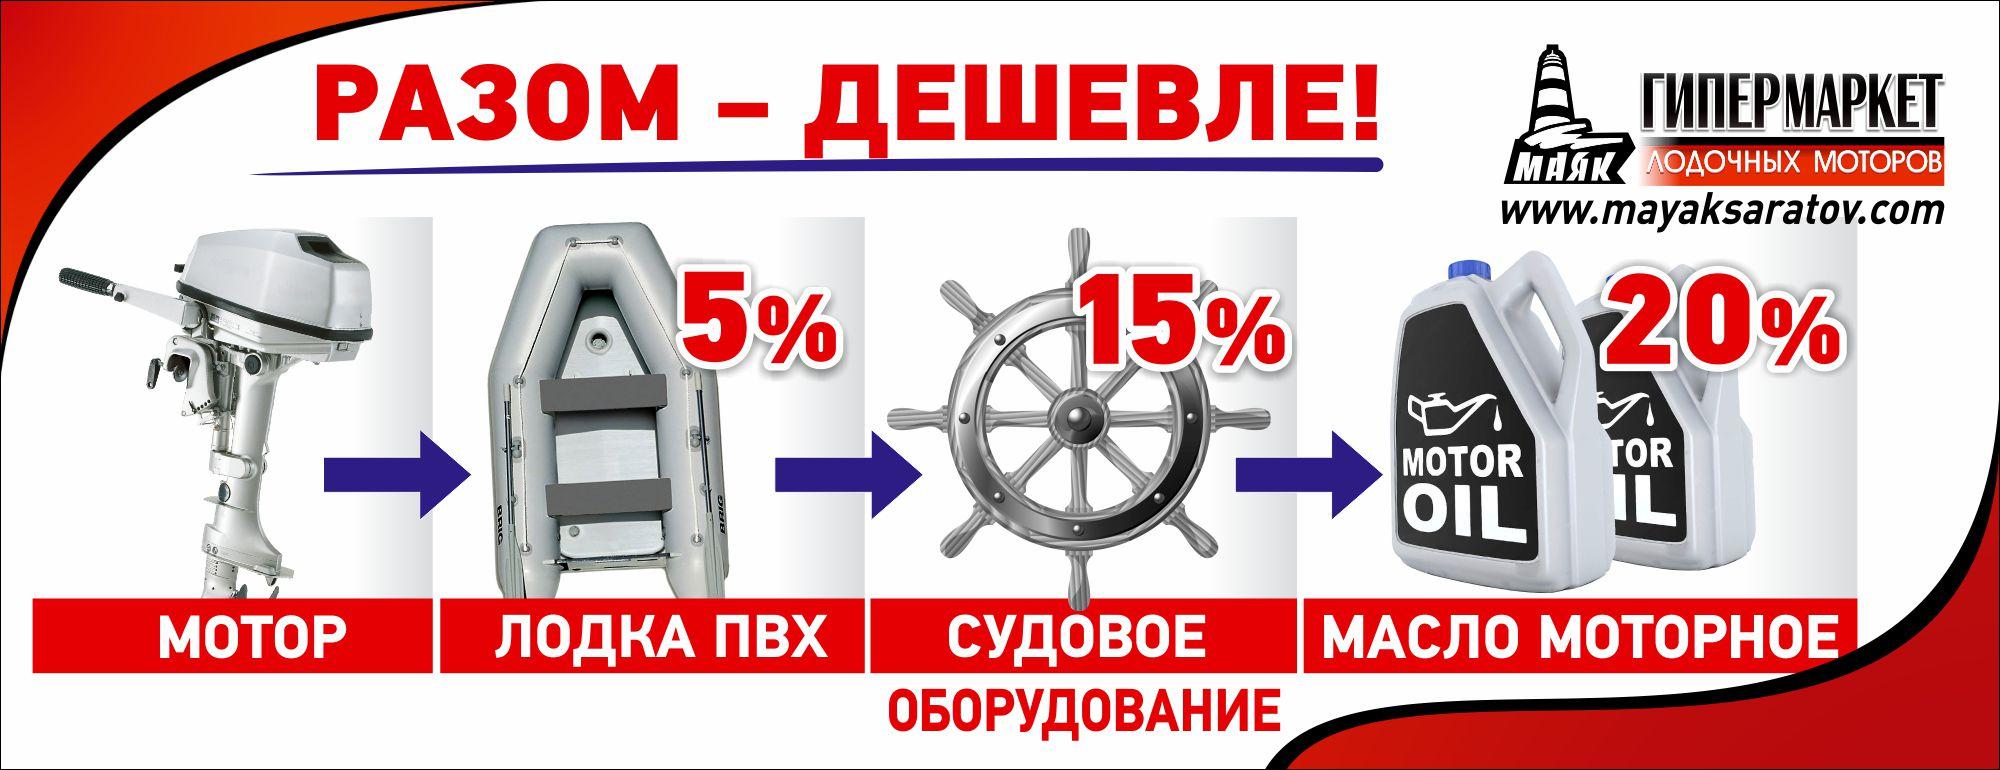 гипермаркет лодочных моторов маяк